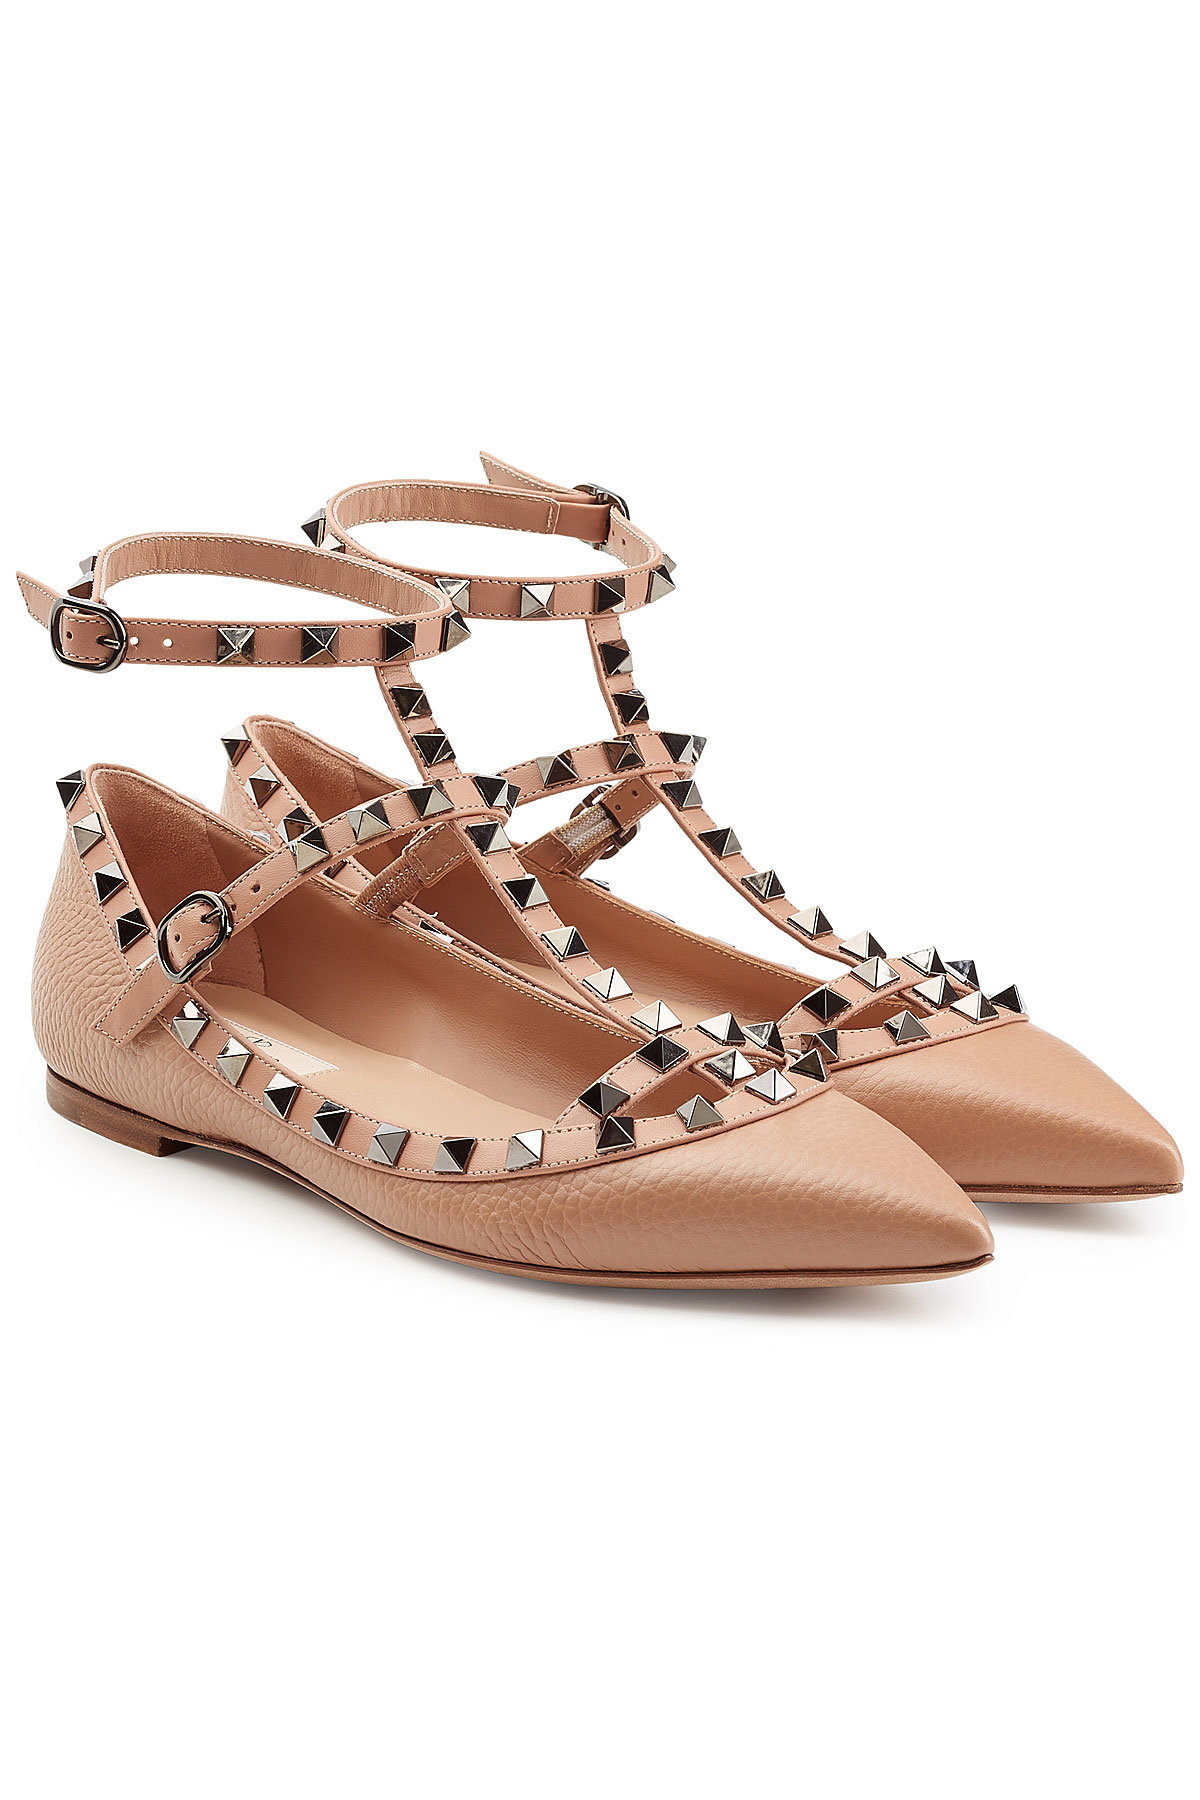 Valentino Rockstud Textured Leather Ballerinas Gr. IT 39